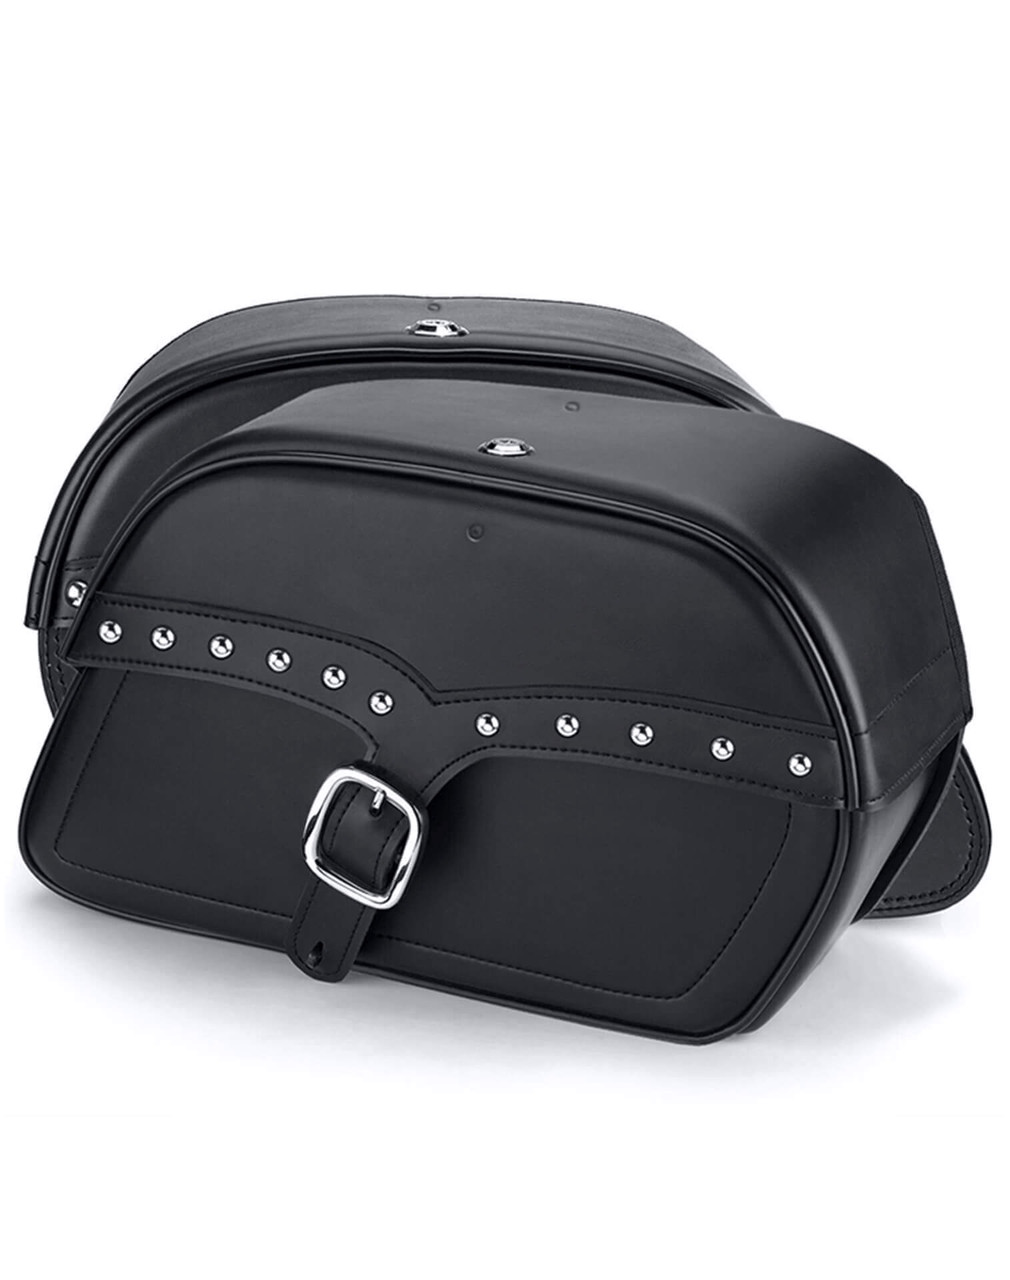 Suzuki Intruder 1500 VL1500 Charger Single Strap Studded Medium Motorcycle Saddlebags Both Bags View